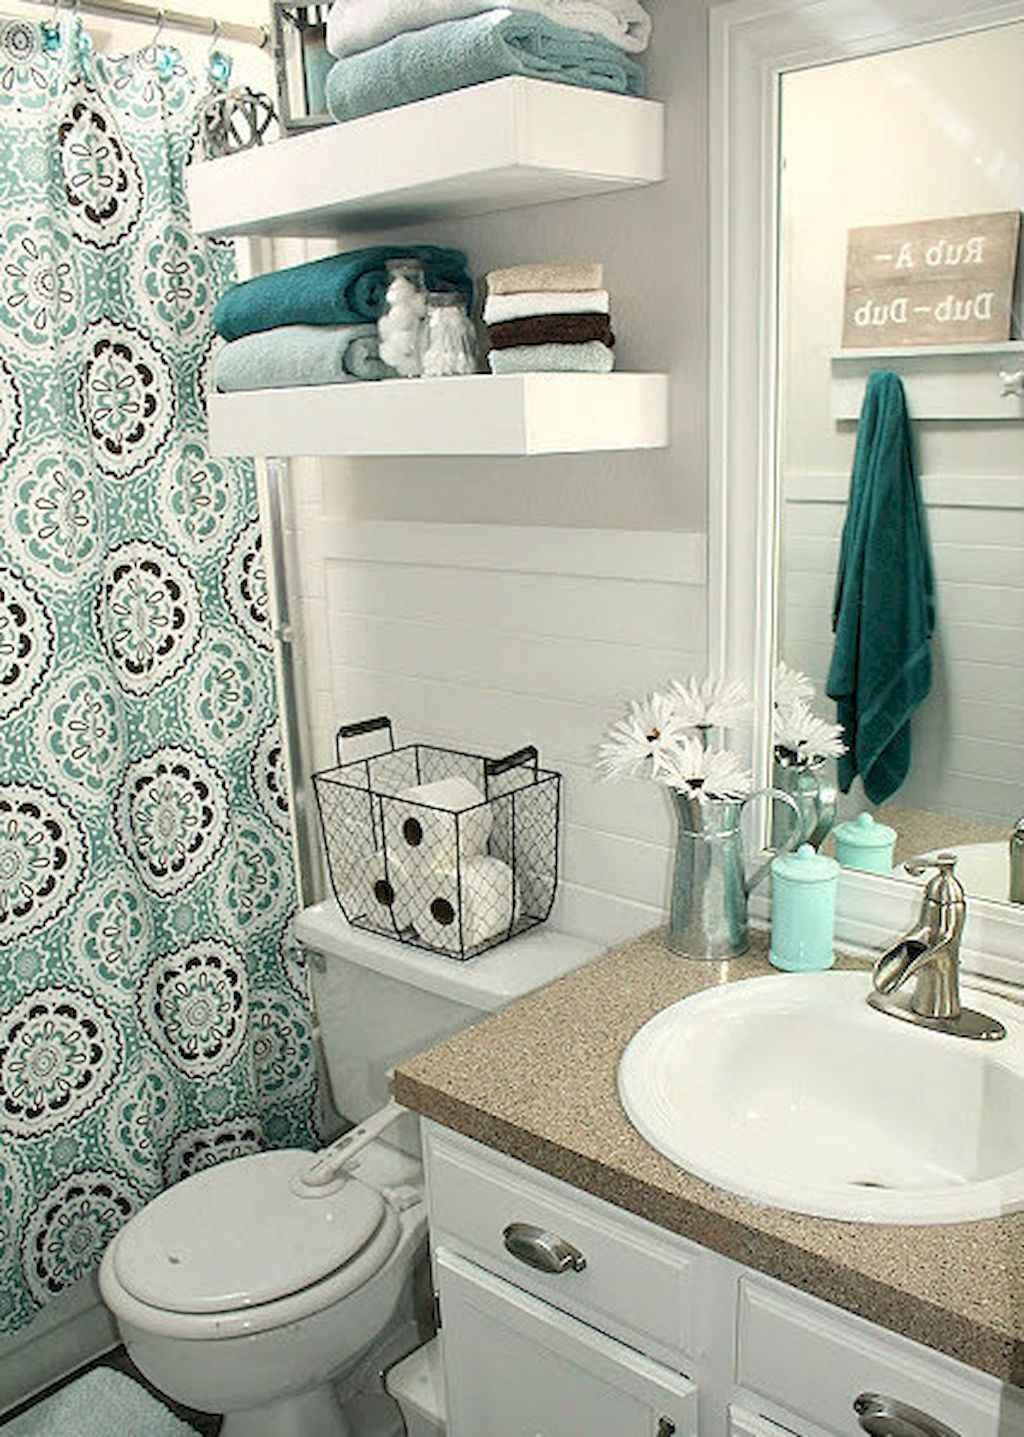 Cool bathroom storage shelves organization ideas (29)